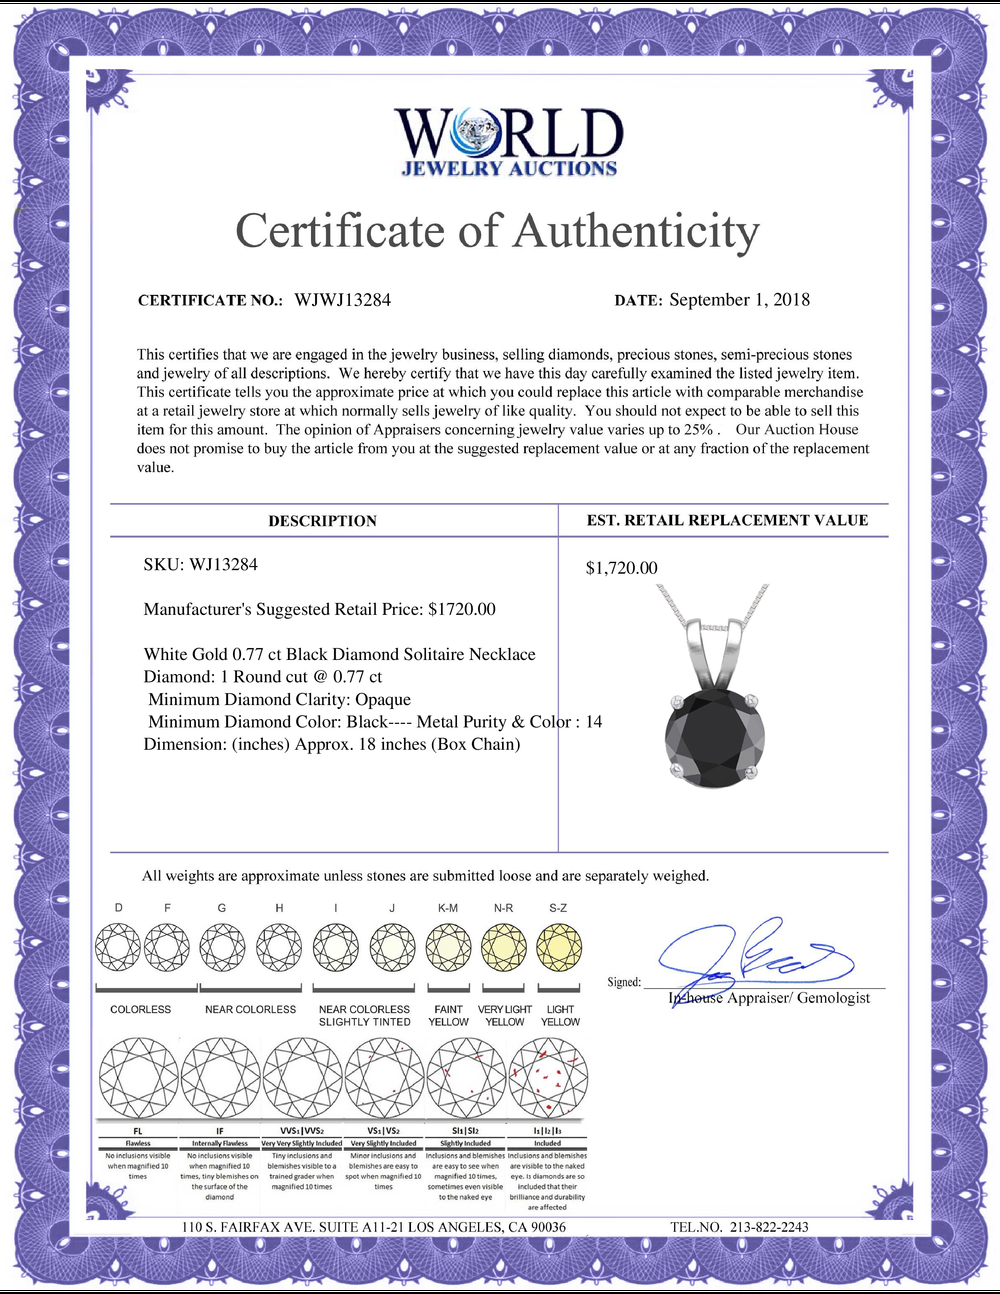 Lot 4103: 14K White Gold 0.77 ct Black Diamond Solitaire Necklace - REF-53X7F-WJ13284